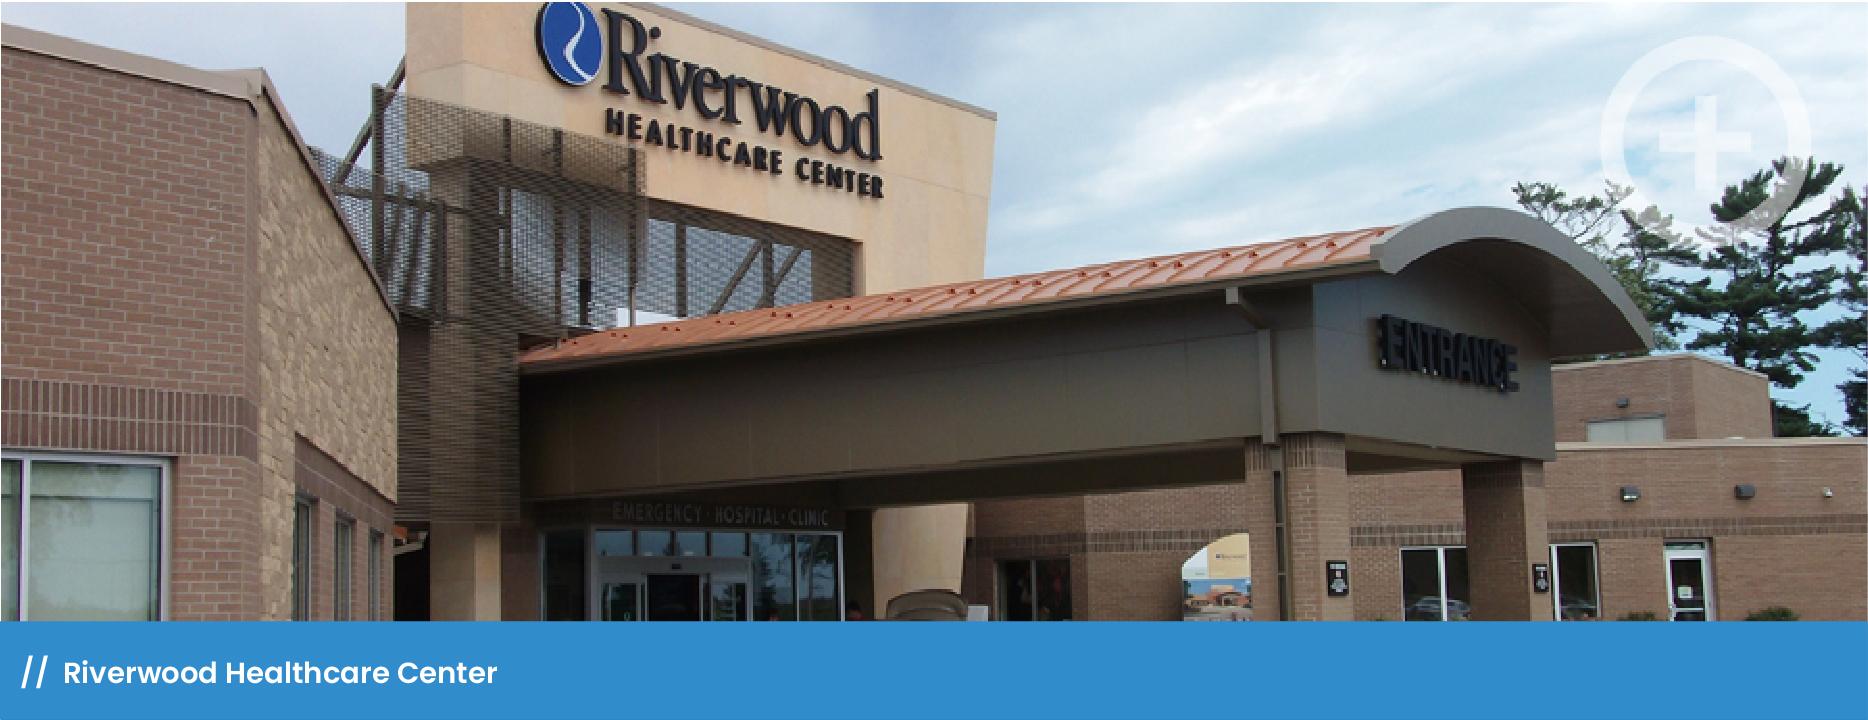 Yanik-Watermark_Riverwood Healthcare Center-